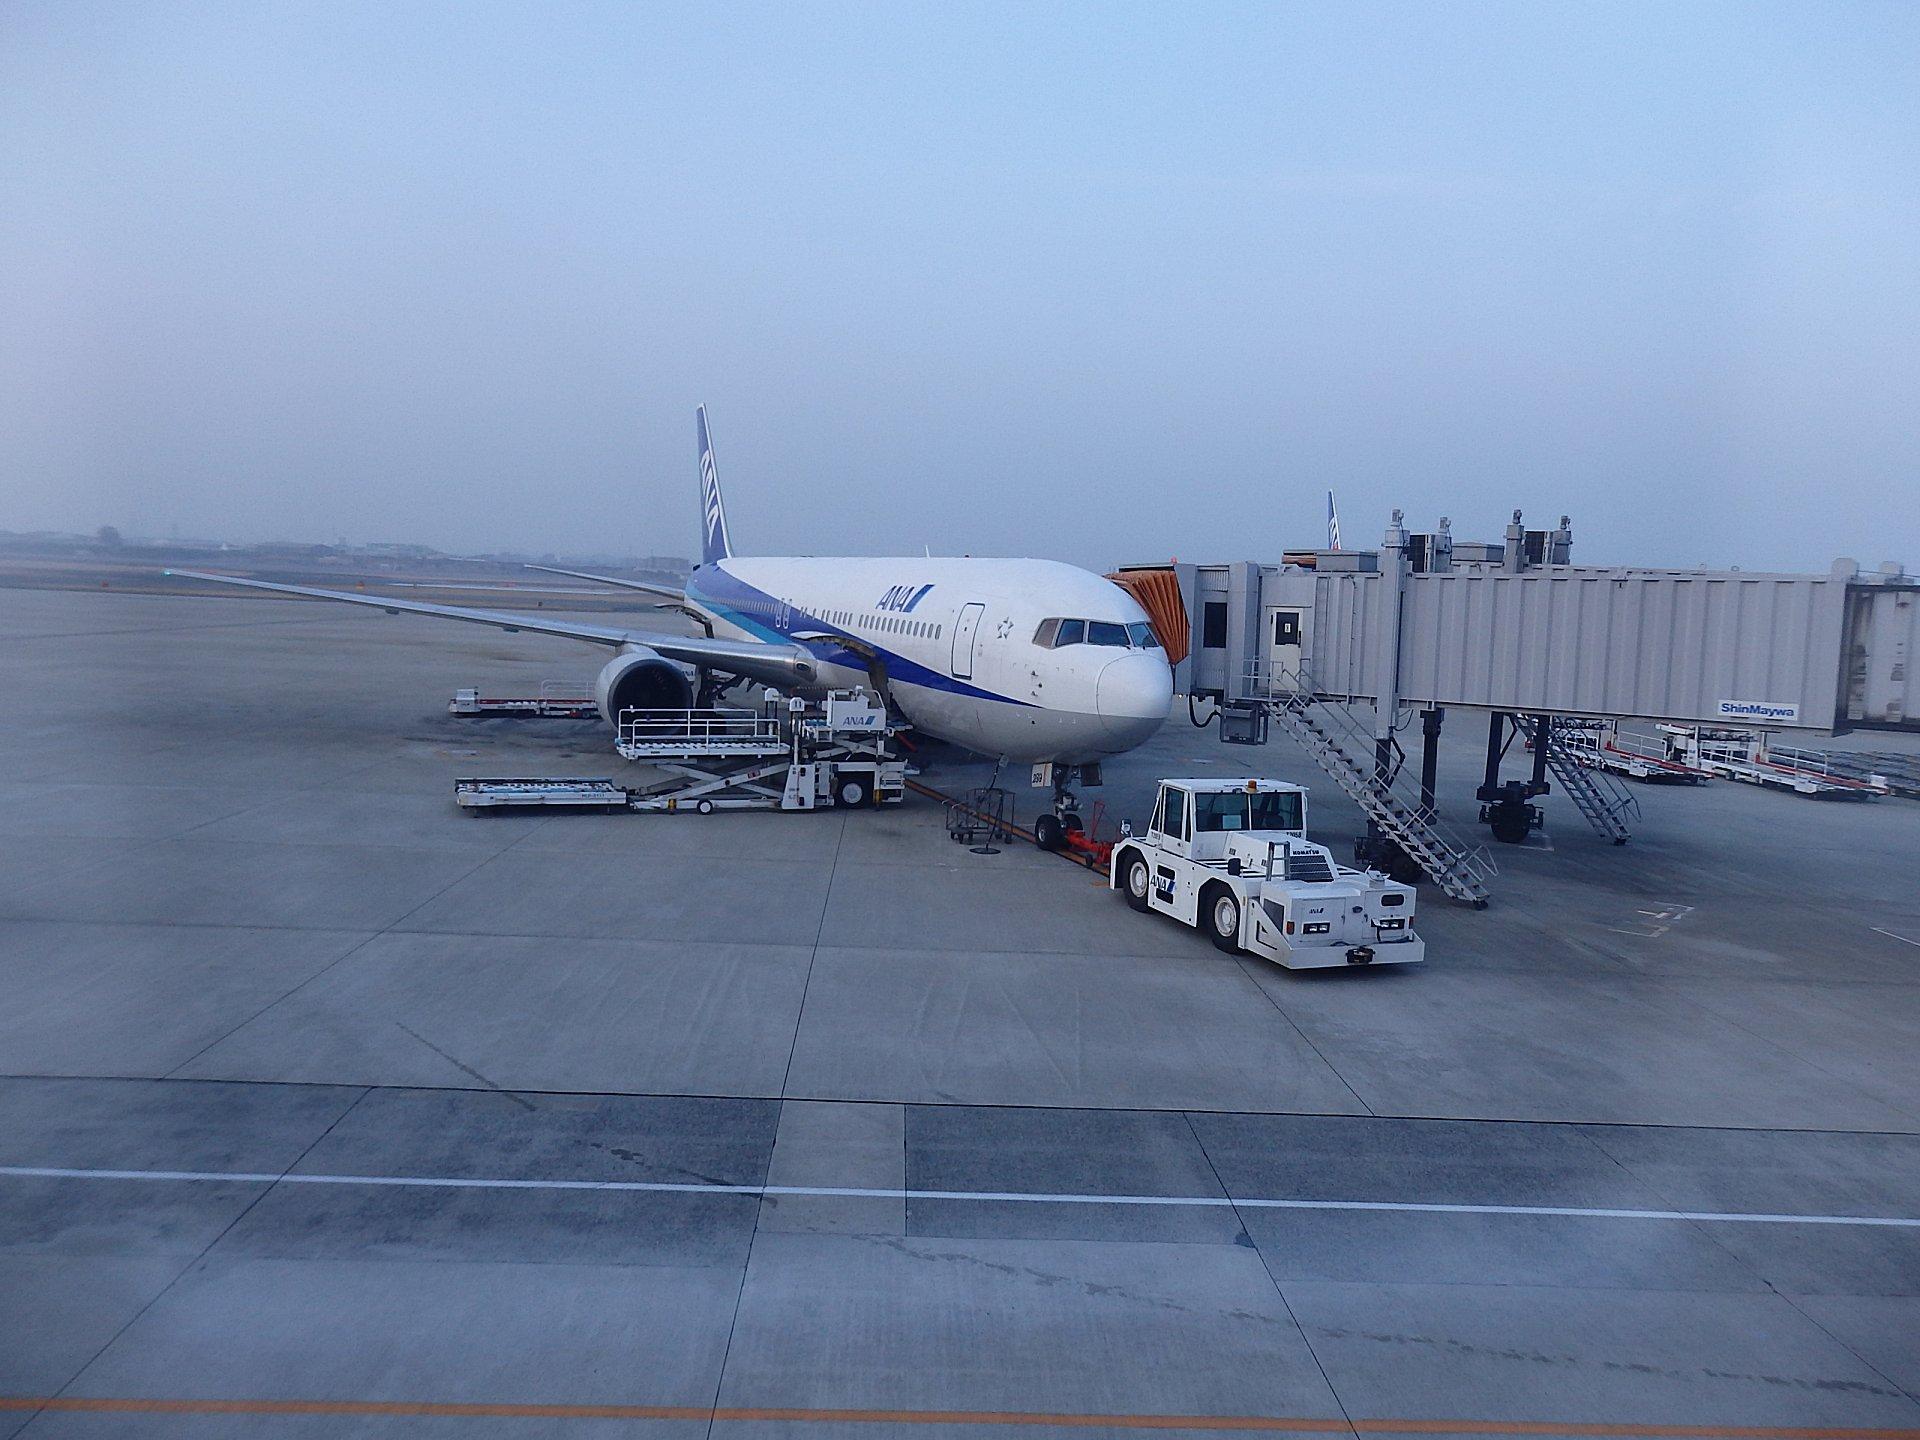 ANA014便に搭乗しました。